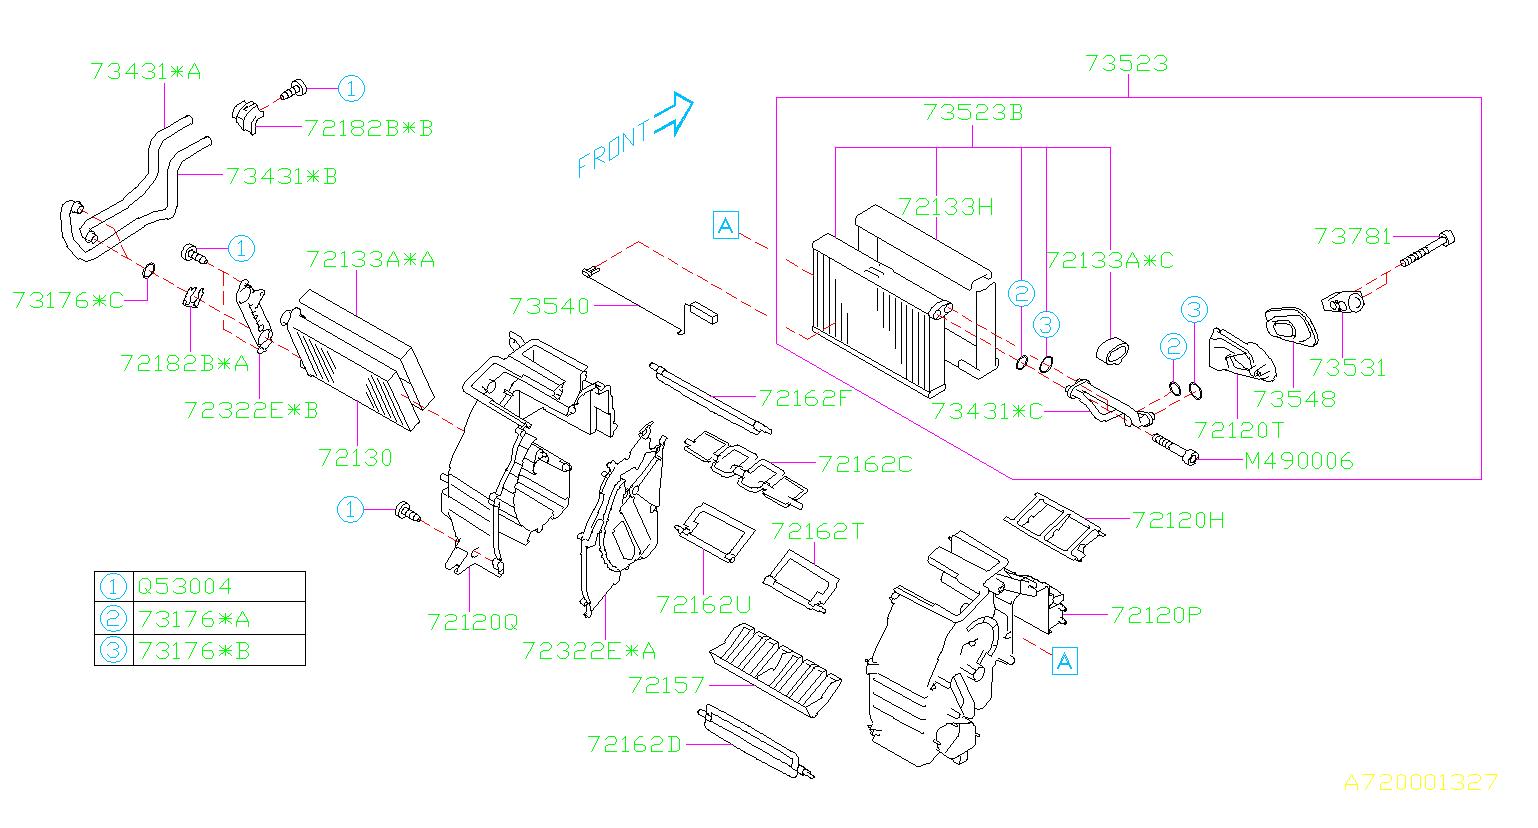 73531yc001 - Expansion Valve-cooling  Heater  System  Unit